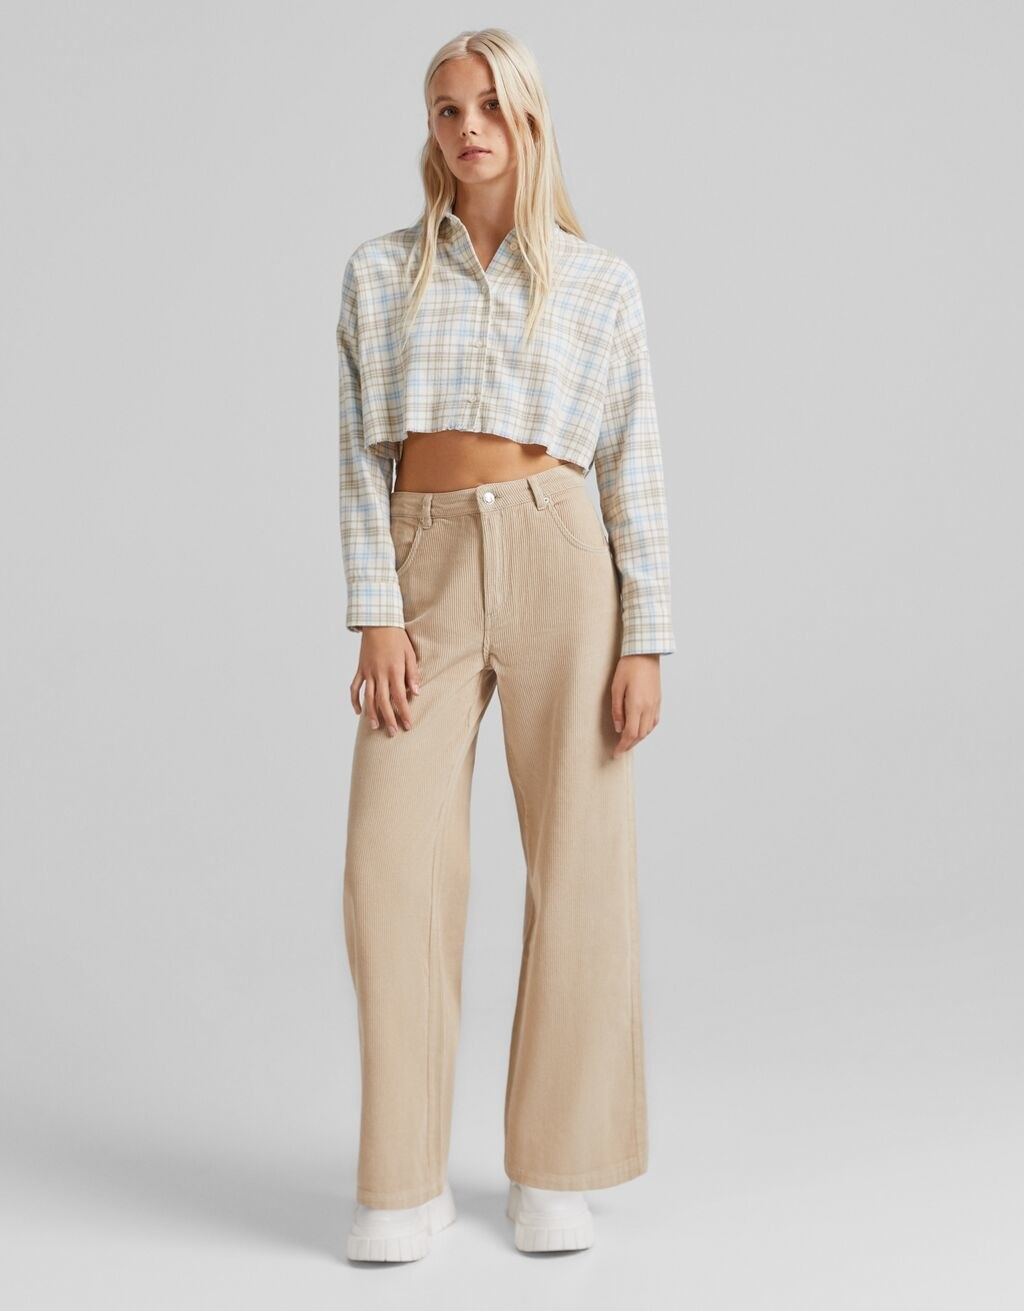 model wearing the cream pants